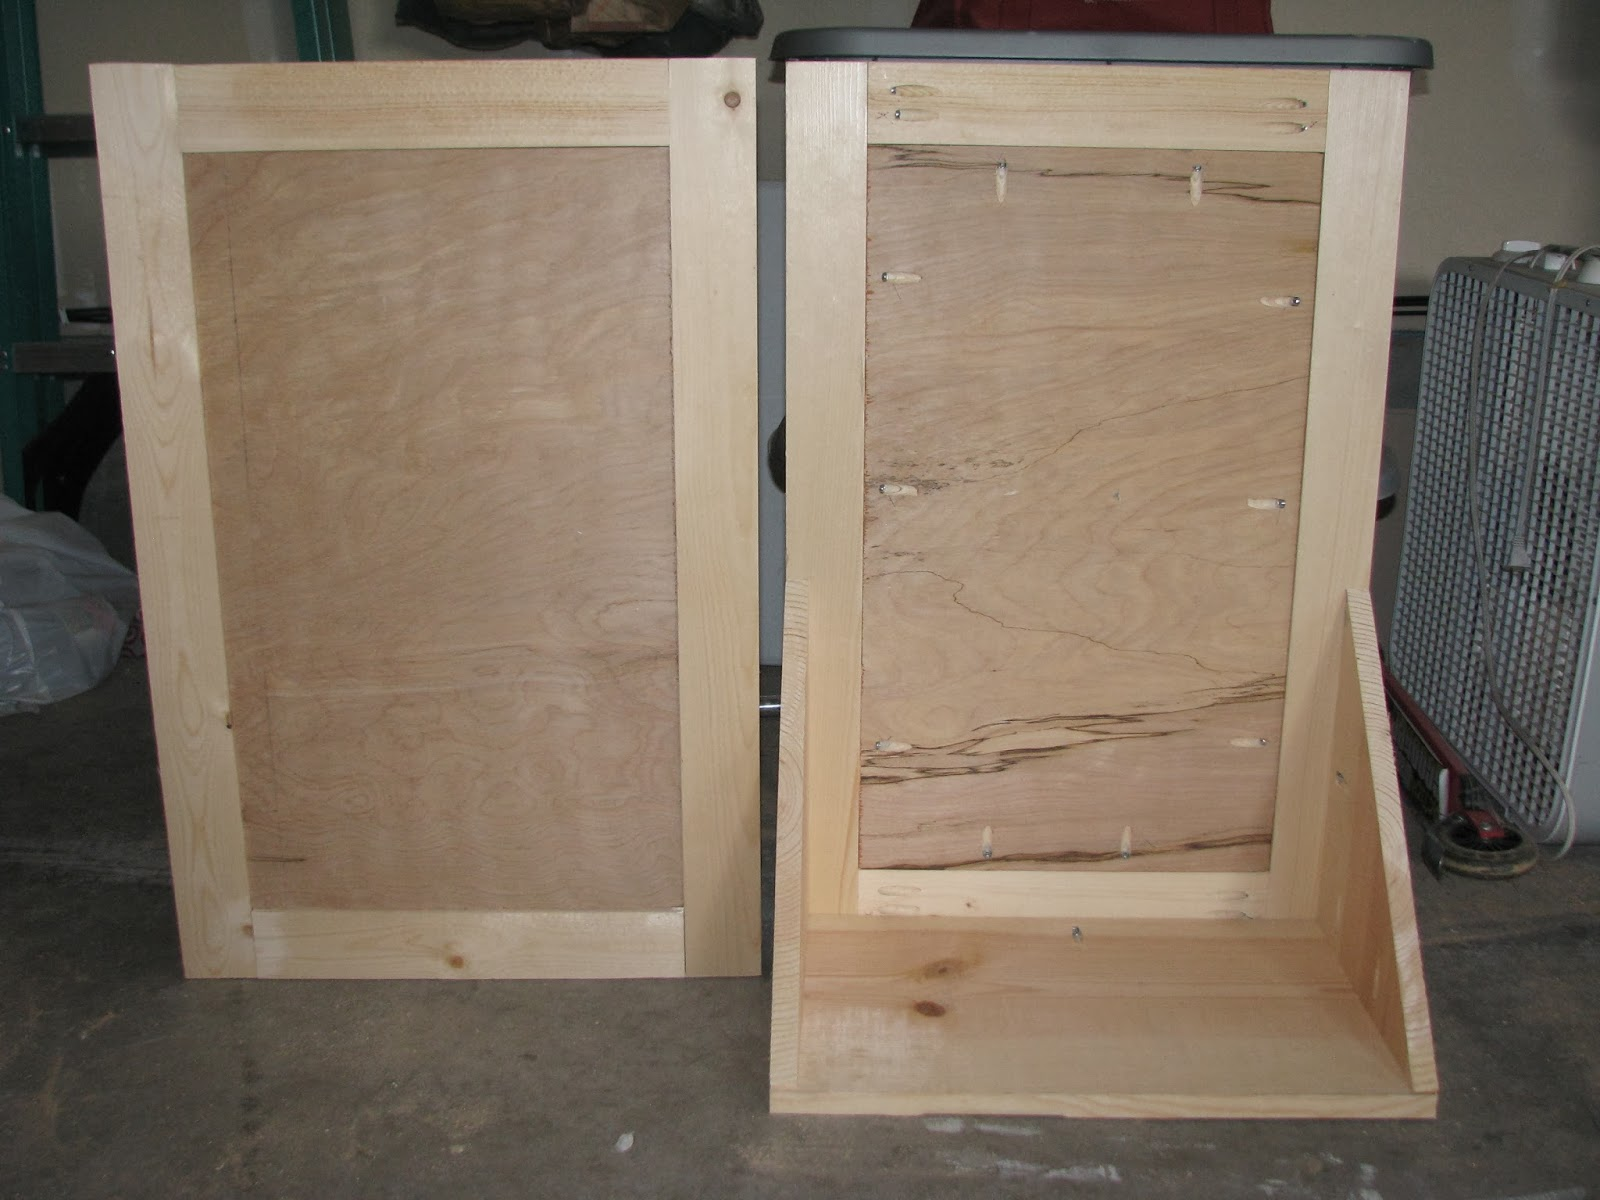 Making Kitchen Cabinet Doors Extractor Fan My So Called Diy Blog Using A Kreg Jig